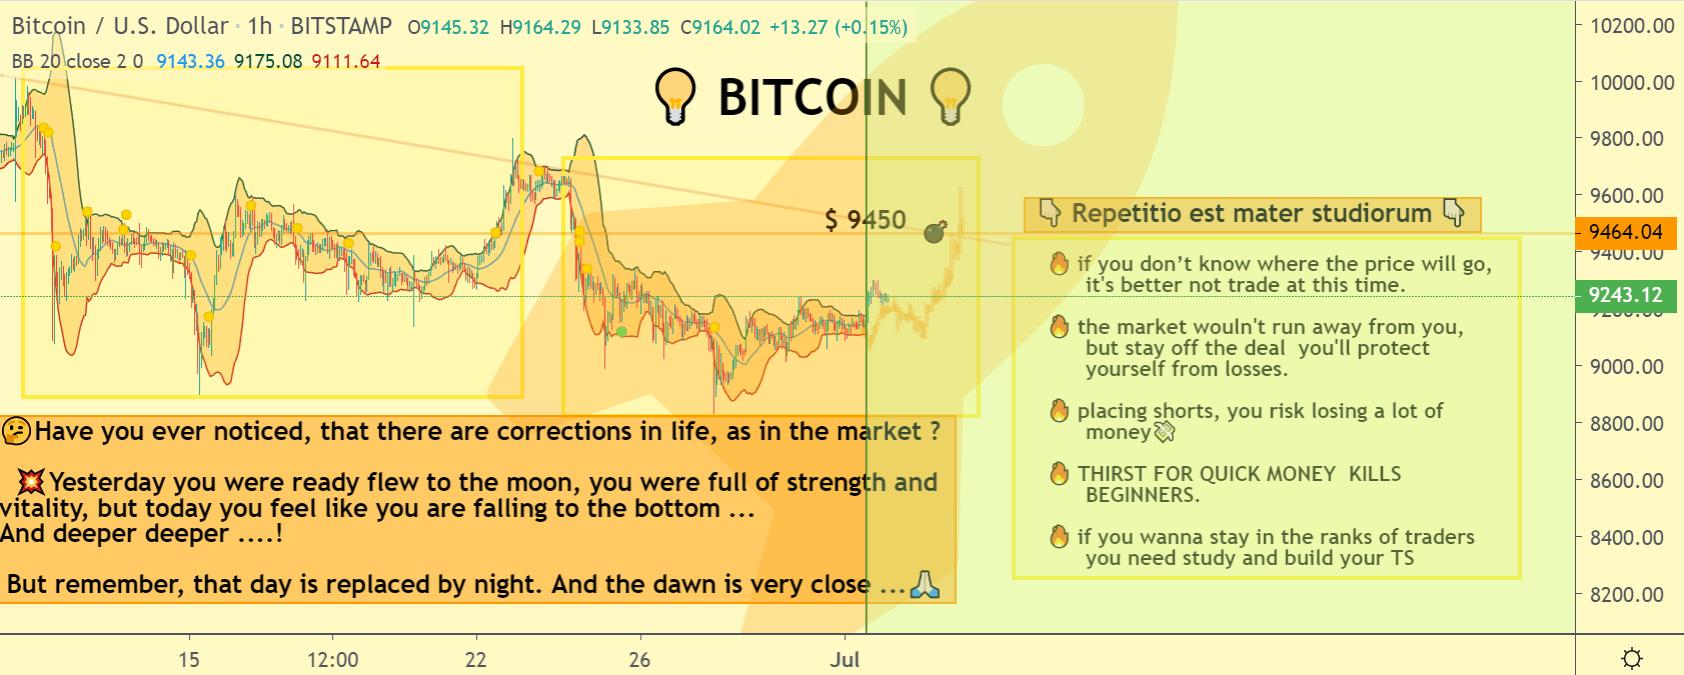 Bitcoin price chart 2 - 1 July